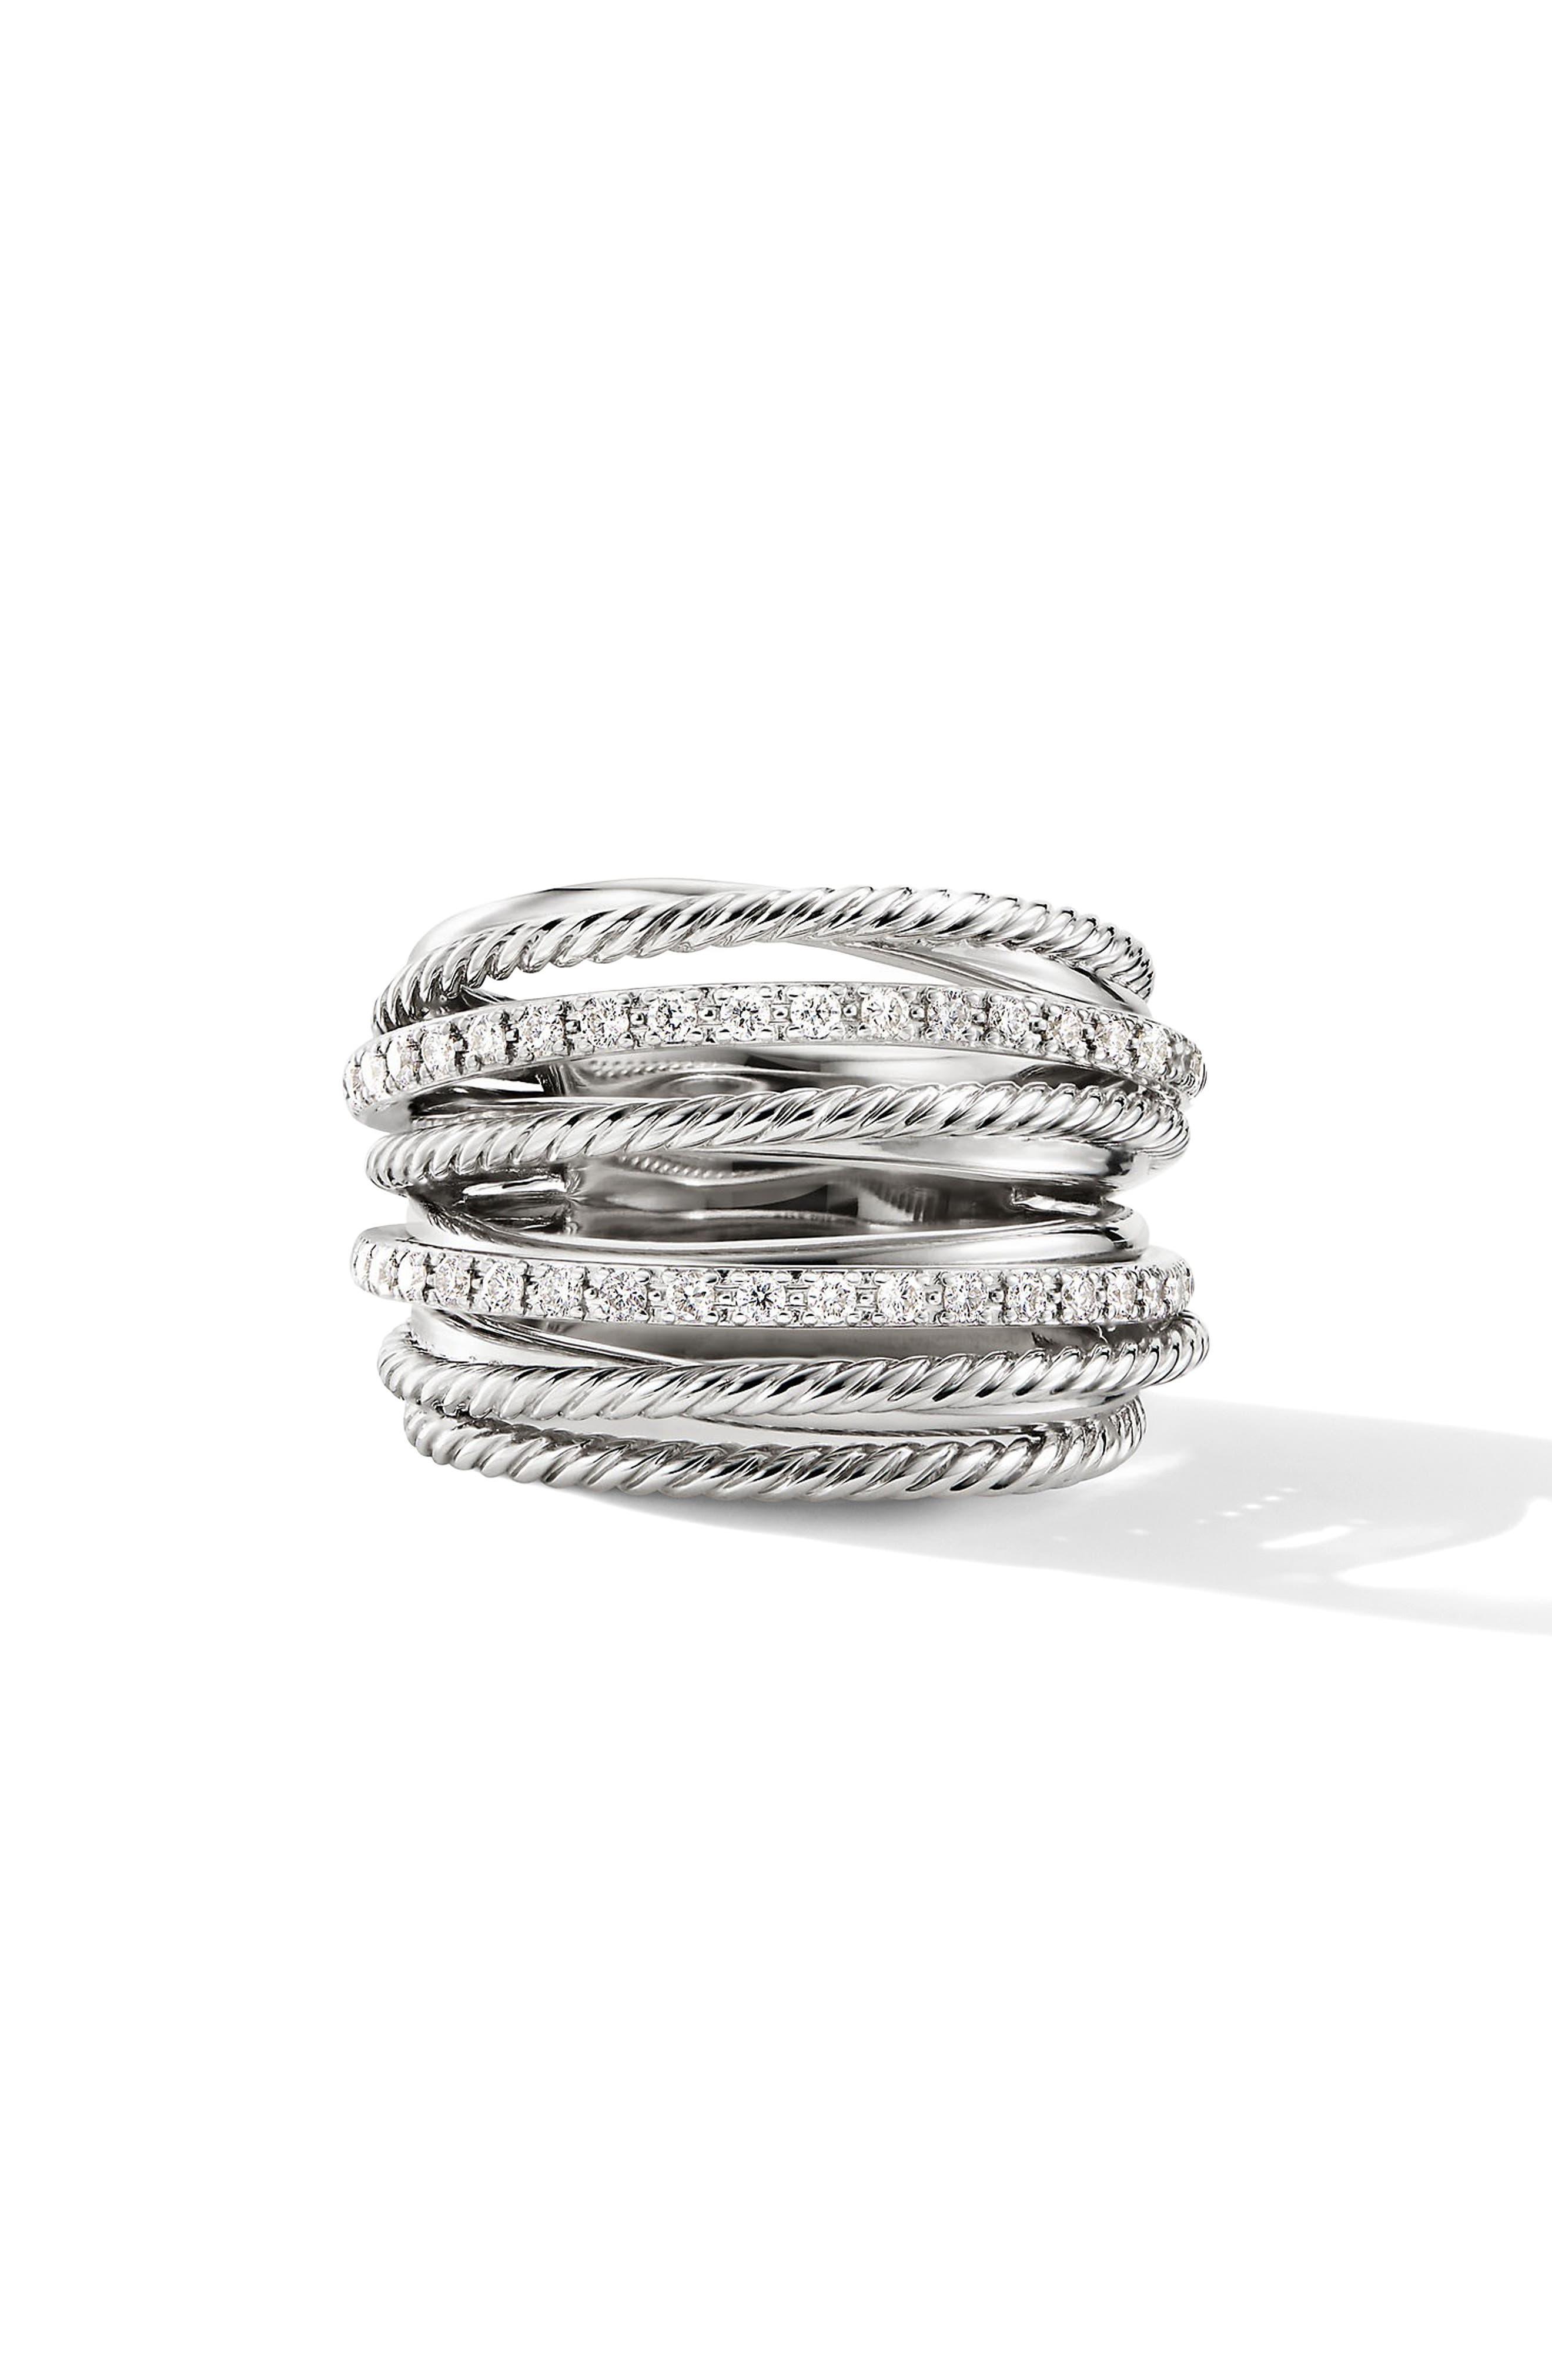 DAVID YURMAN, Wide Crossover Pavé Diamond Ring, Main thumbnail 1, color, SILVER/ DIAMOND